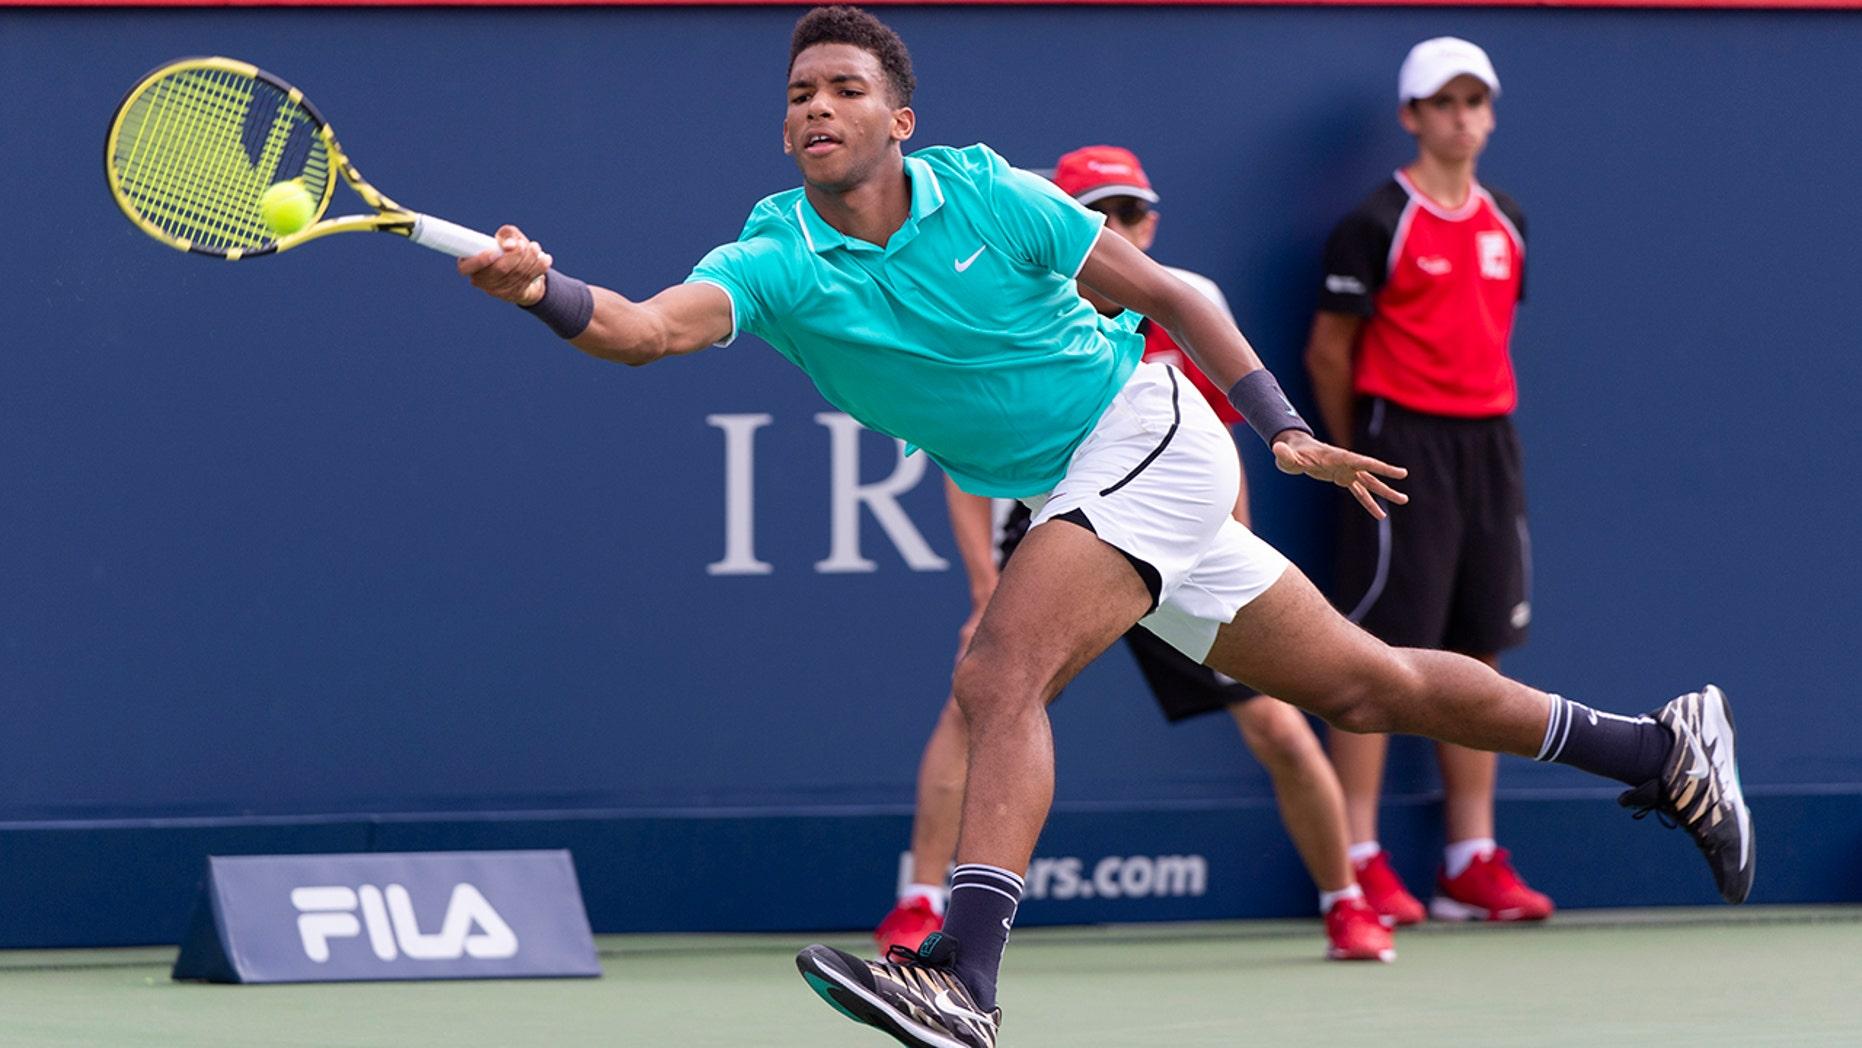 Westlake Legal Group TEN-Felix-Auger-Aliassime2 Auger-Aliassime wins, Kyrgios falls at Rogers Cup fox-news/sports/tennis fnc/sports fnc Associated Press article 97944c0e-8537-50a6-9f1d-557d8ed7bd06